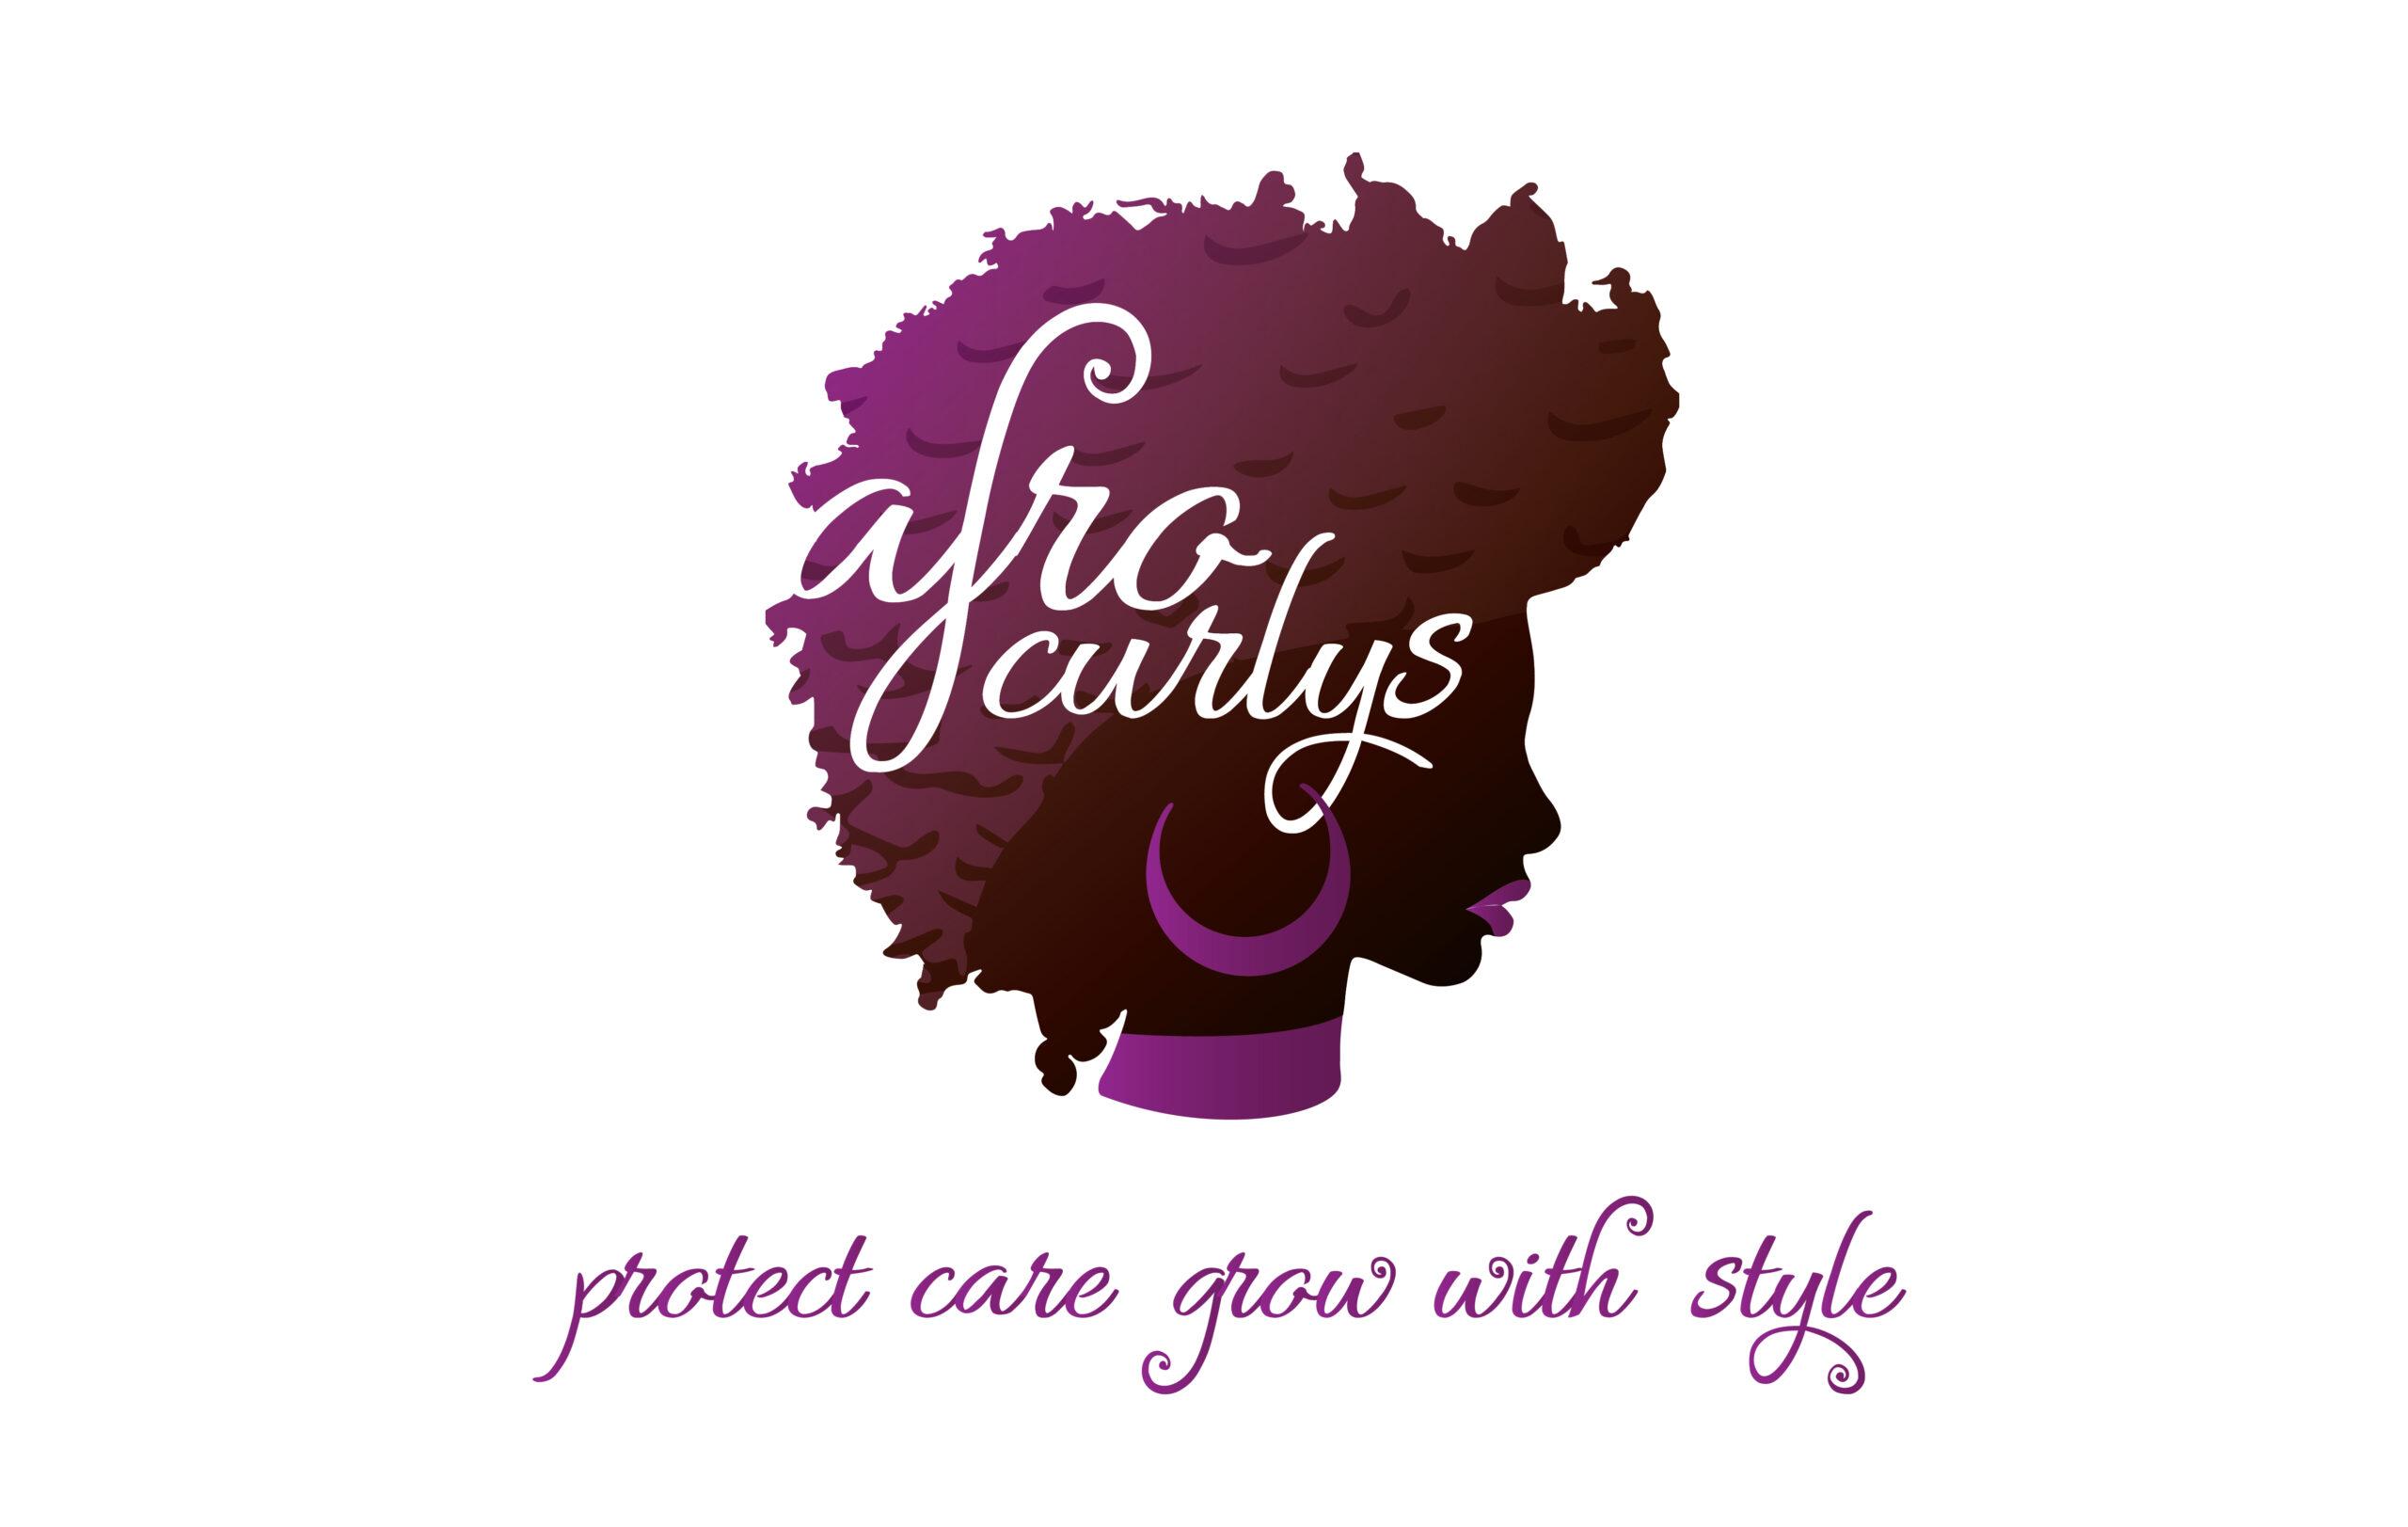 Afrocurlys logo